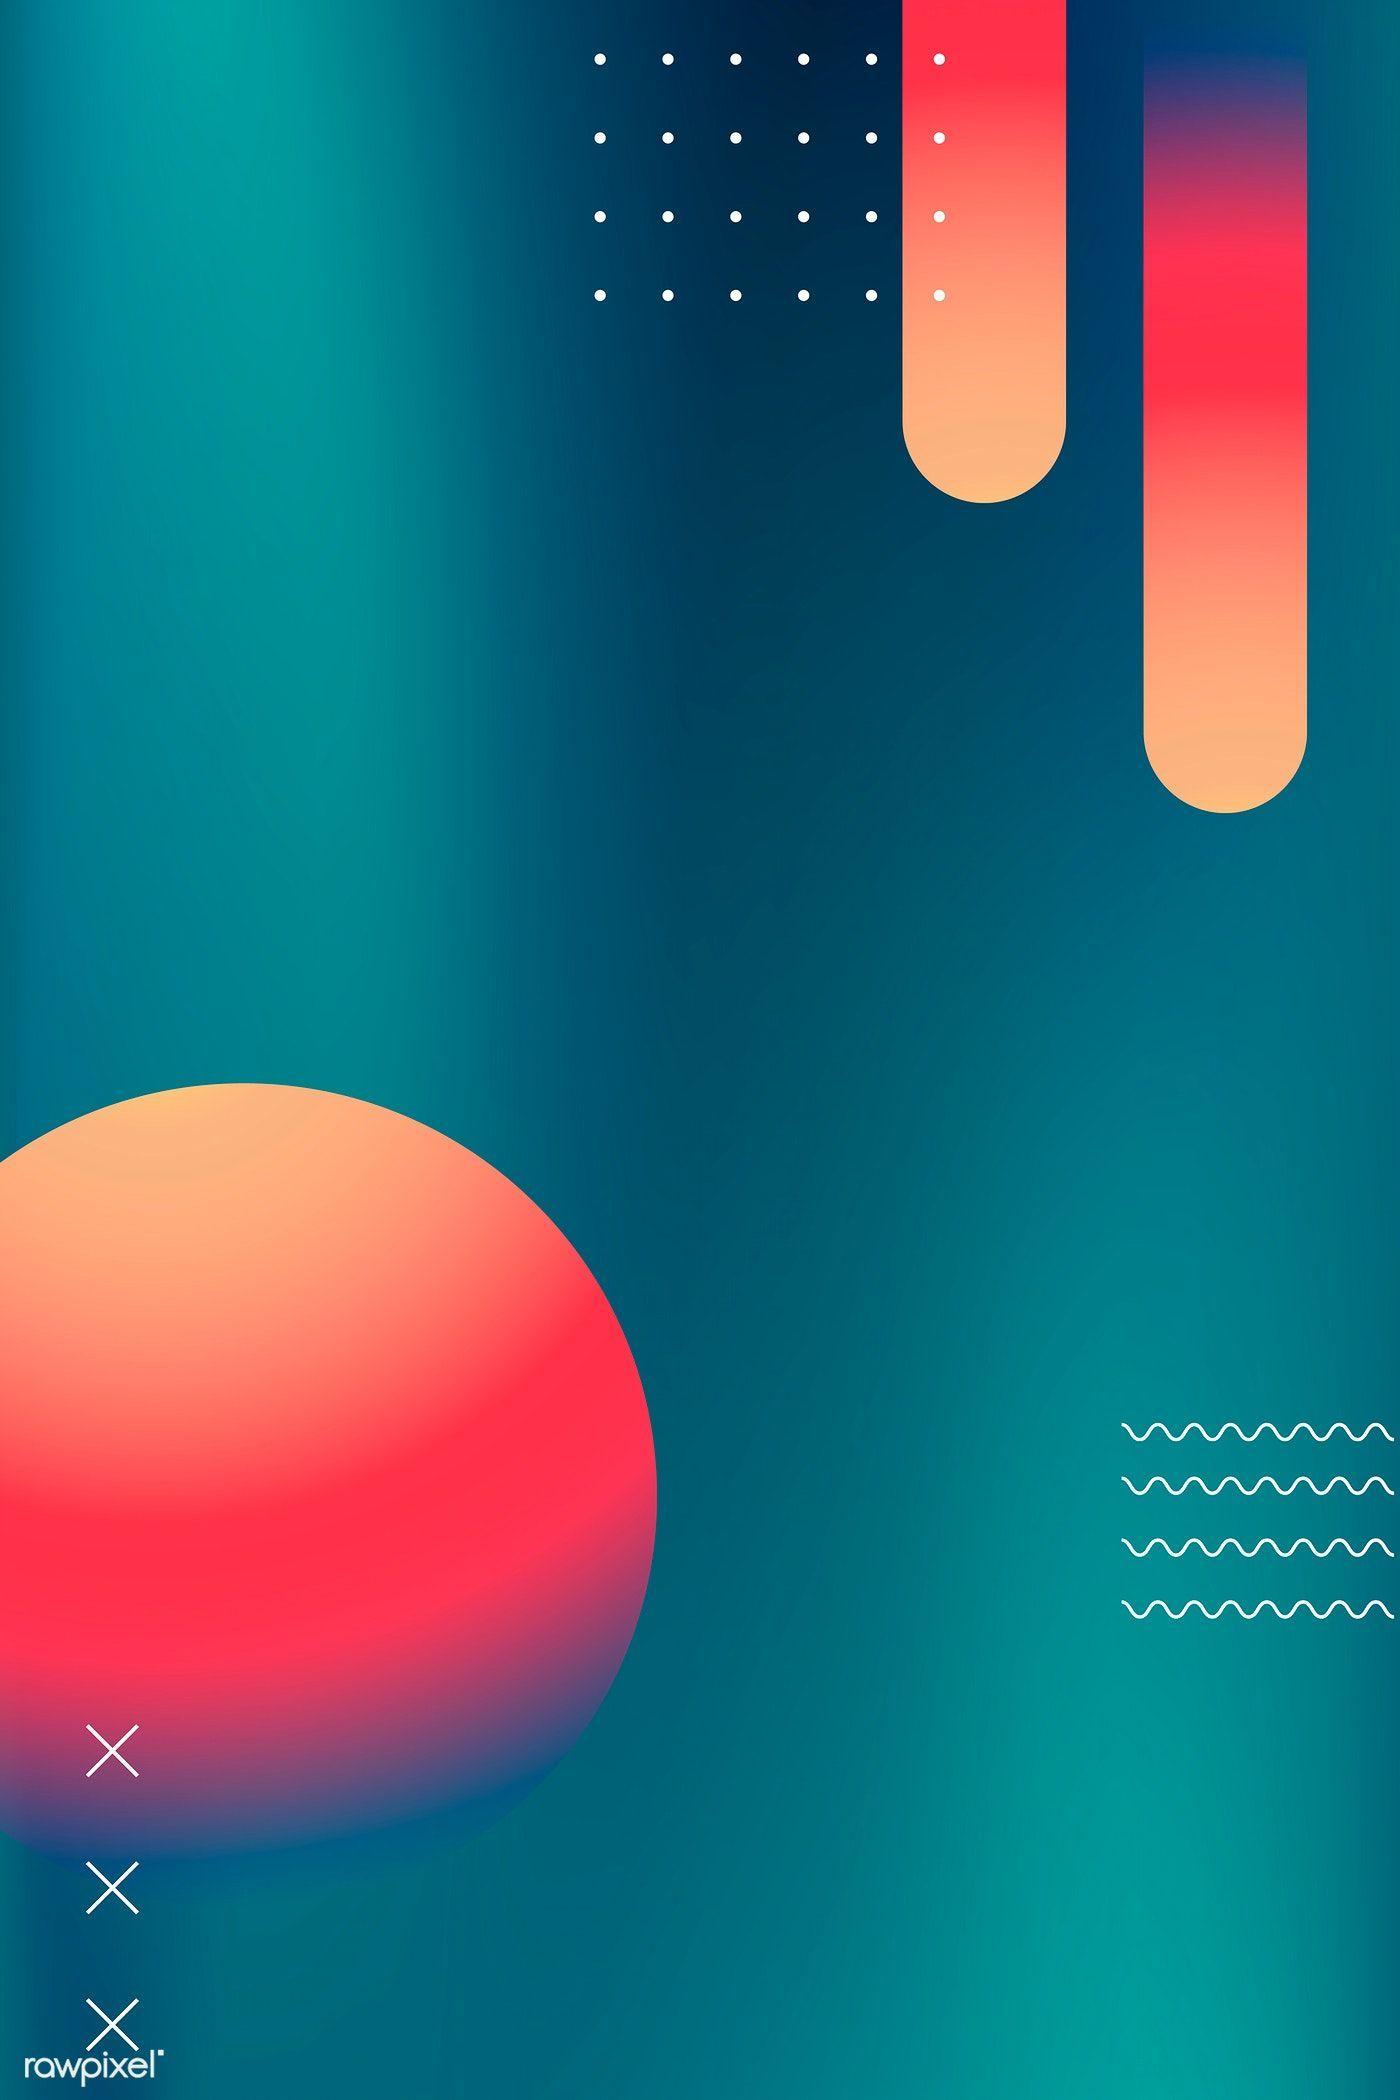 Colorful vibrant summer poster vector   premium image by rawpixel.com / 杜珮甄 #vector #vectorart